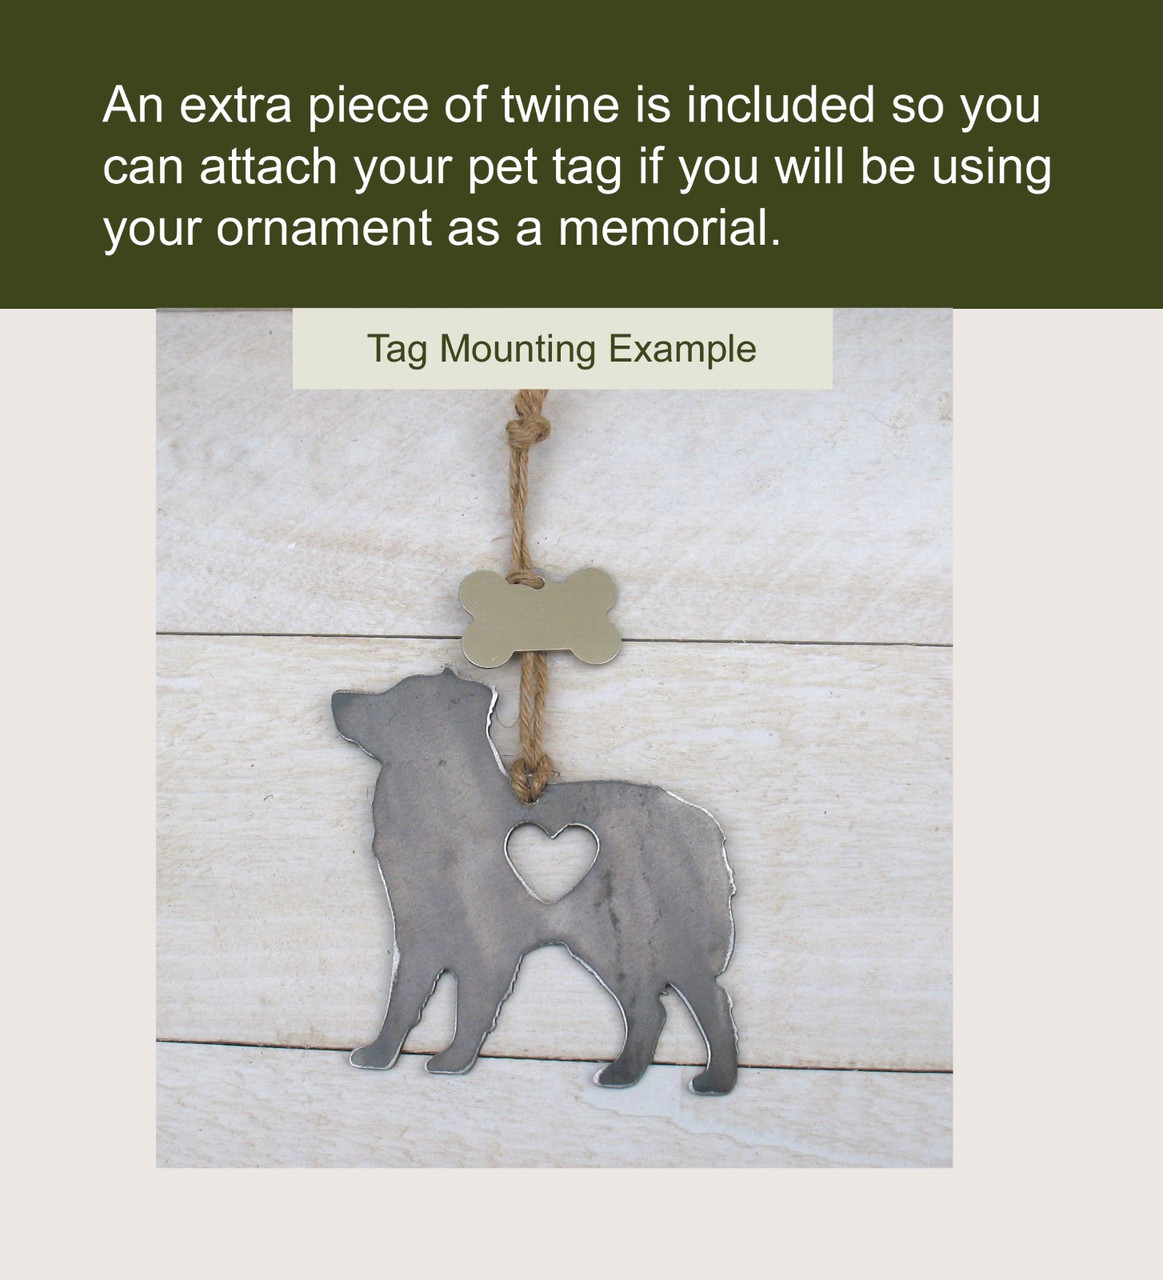 Cat 3 Ornament - Rustic Raw Steel Easter Basket Gift for Her Him - Metal Pet Memorial Gift - Cat Lover Gift Ornament